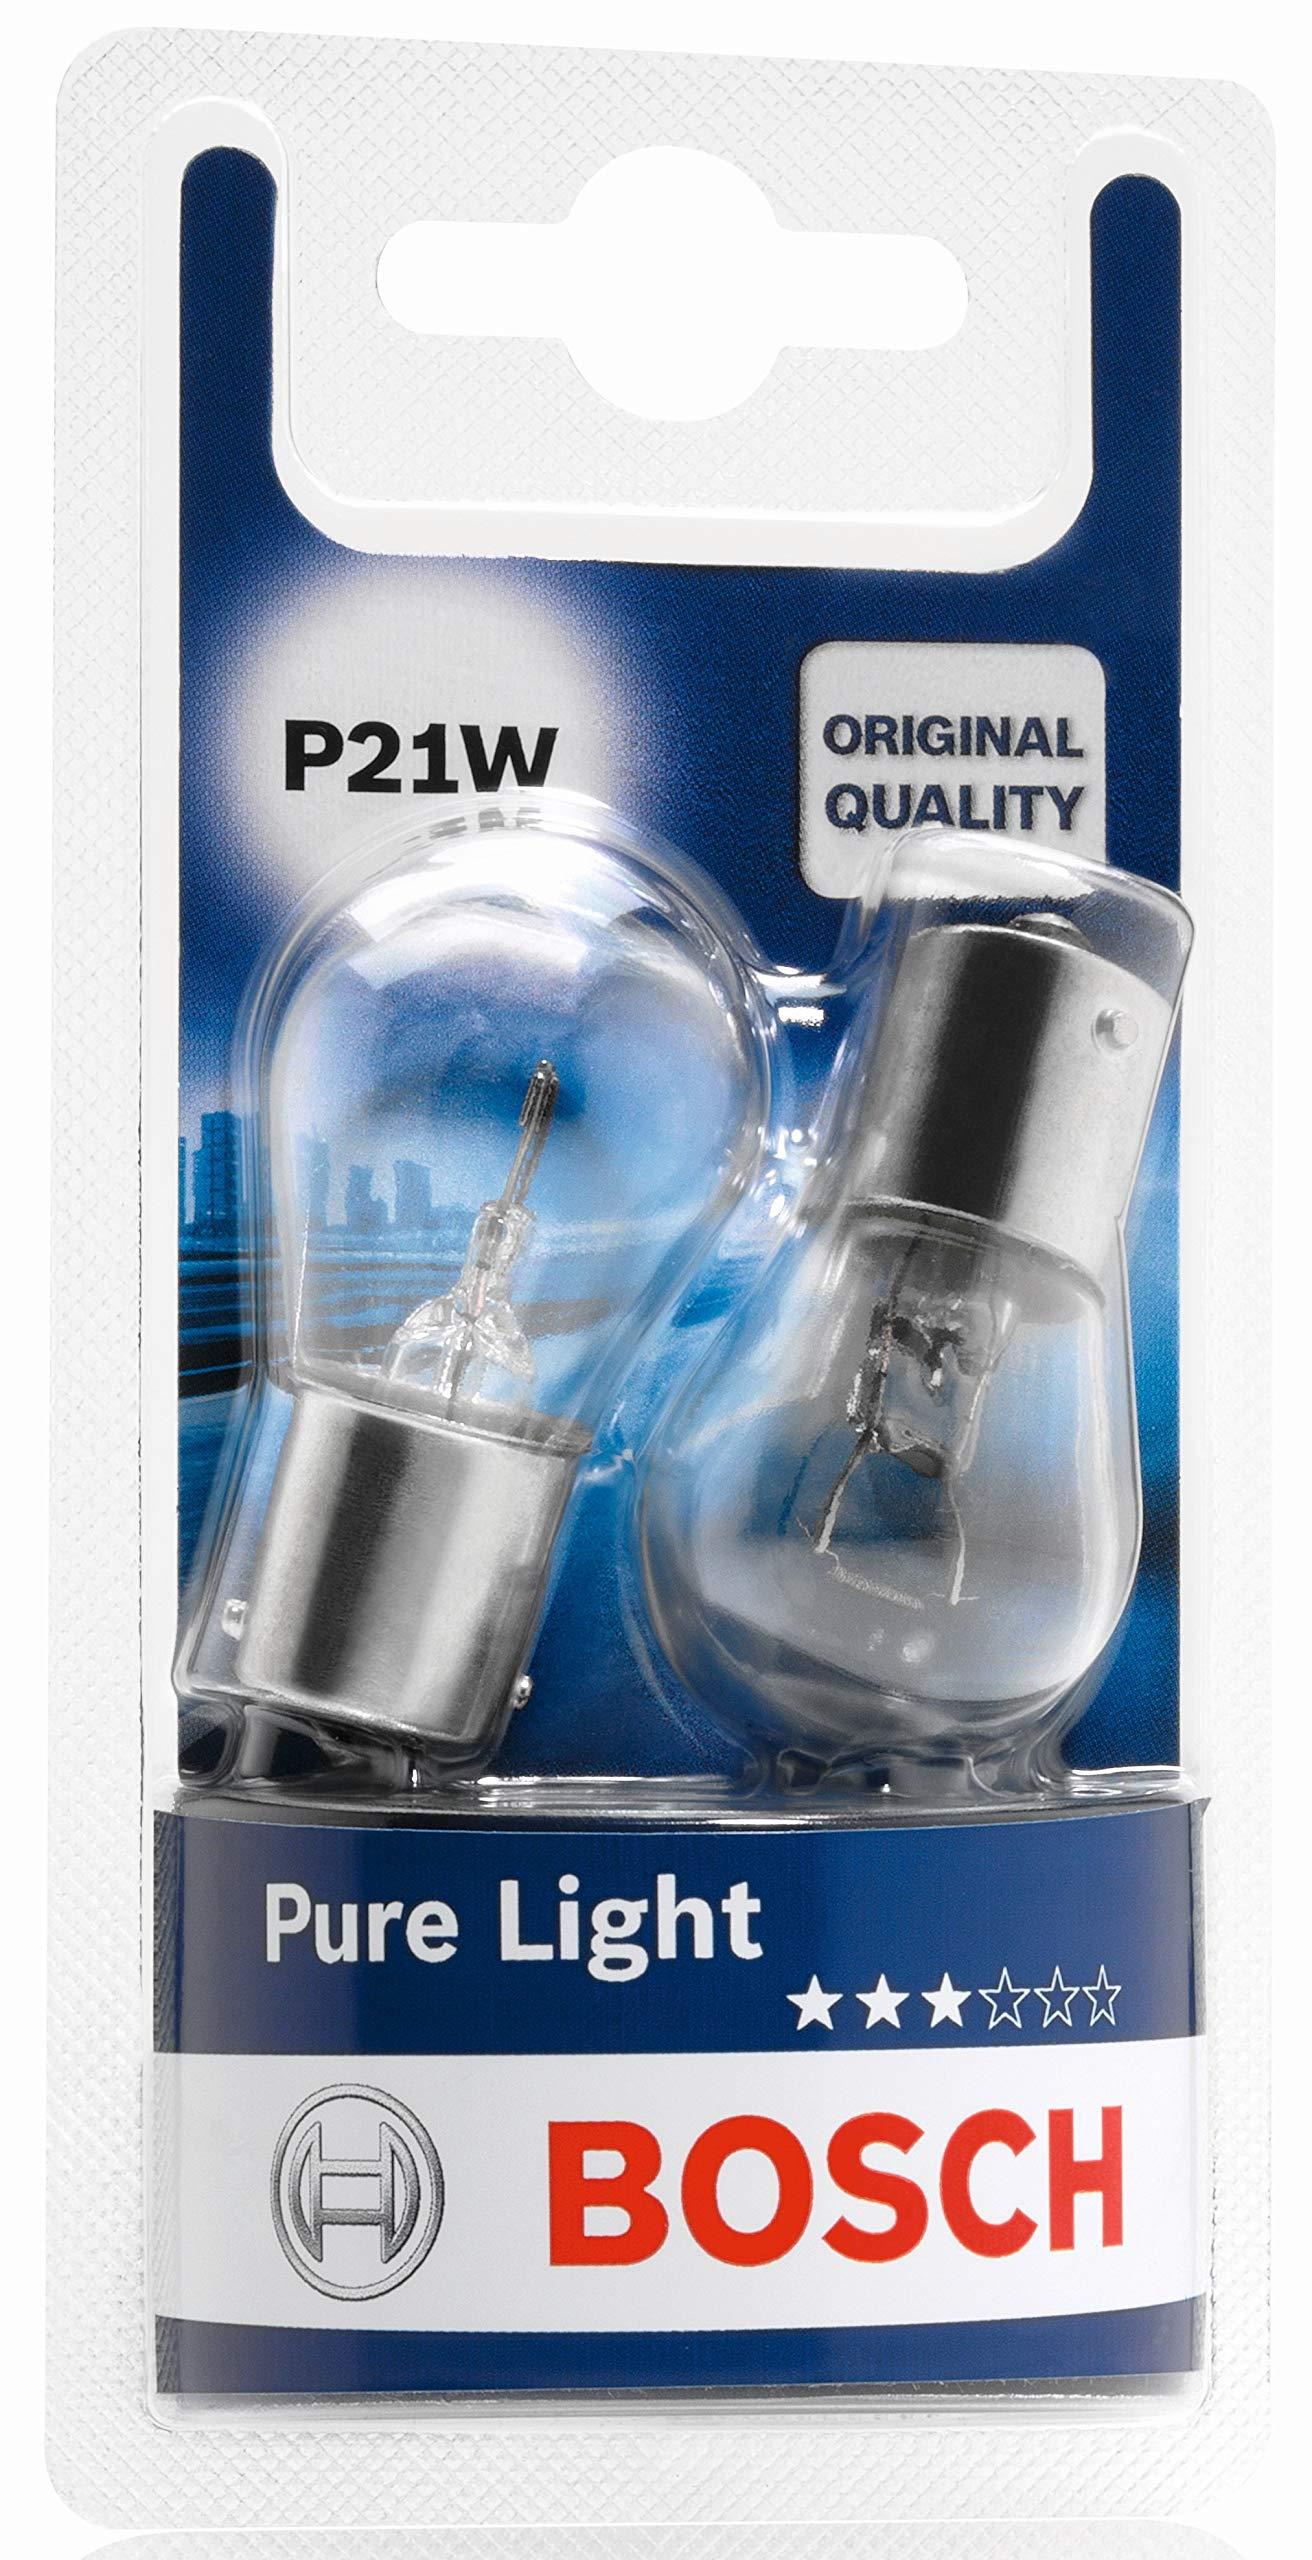 Licence Plate Light Bosch 1987301017 Car Light Bulb Taillight P21W Pure Light Turn Signal Brake Light